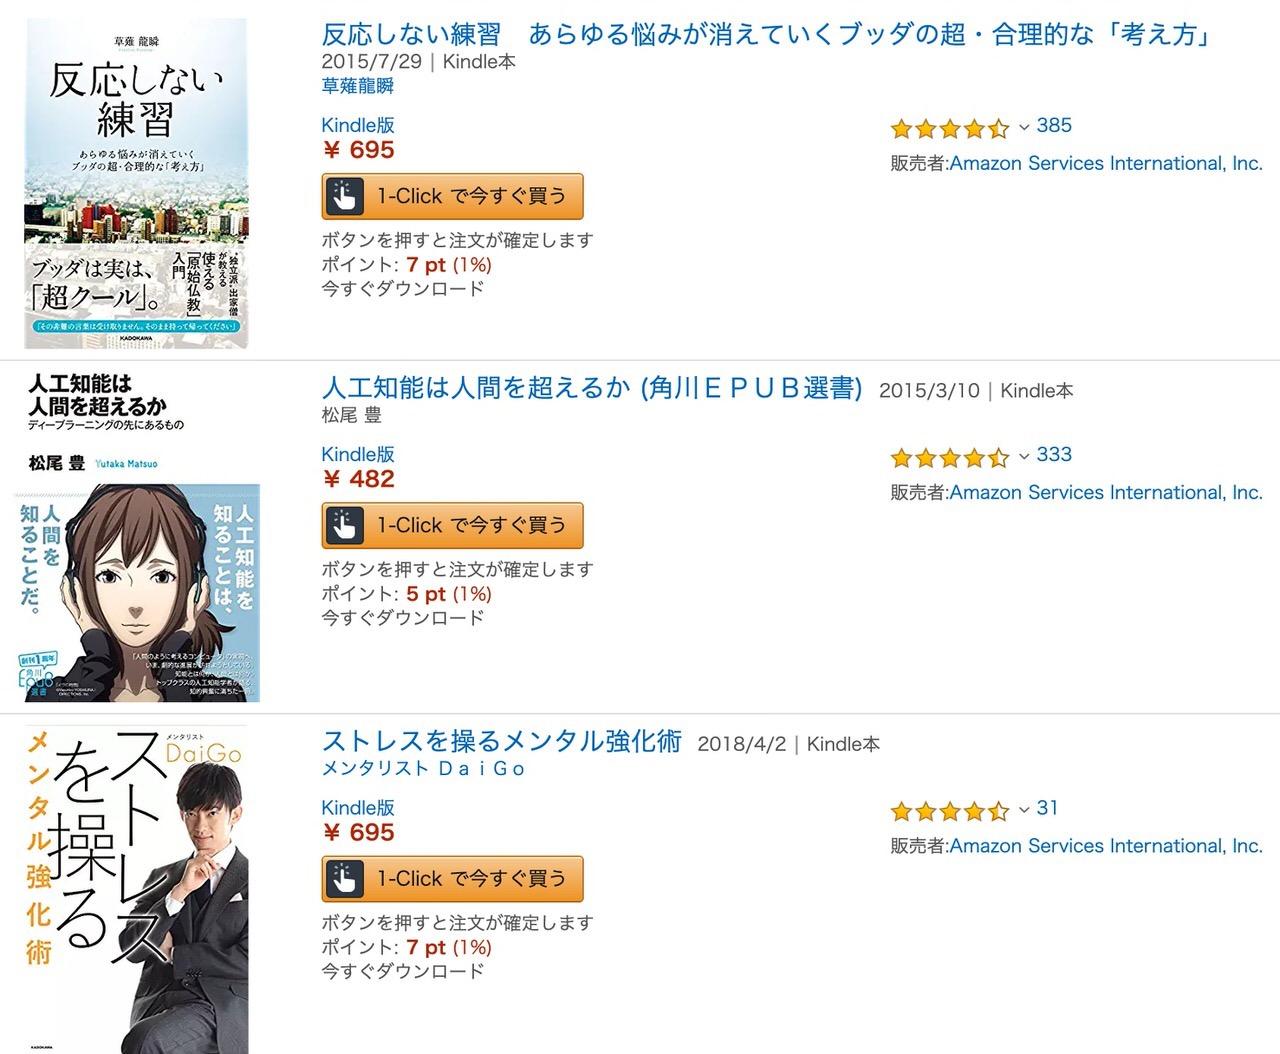 【Kindleセール】ライフハック大全、勉強大全など最大70%OFF「KADOKAWA夏の読書応援フェア」開催中(8/8まで)